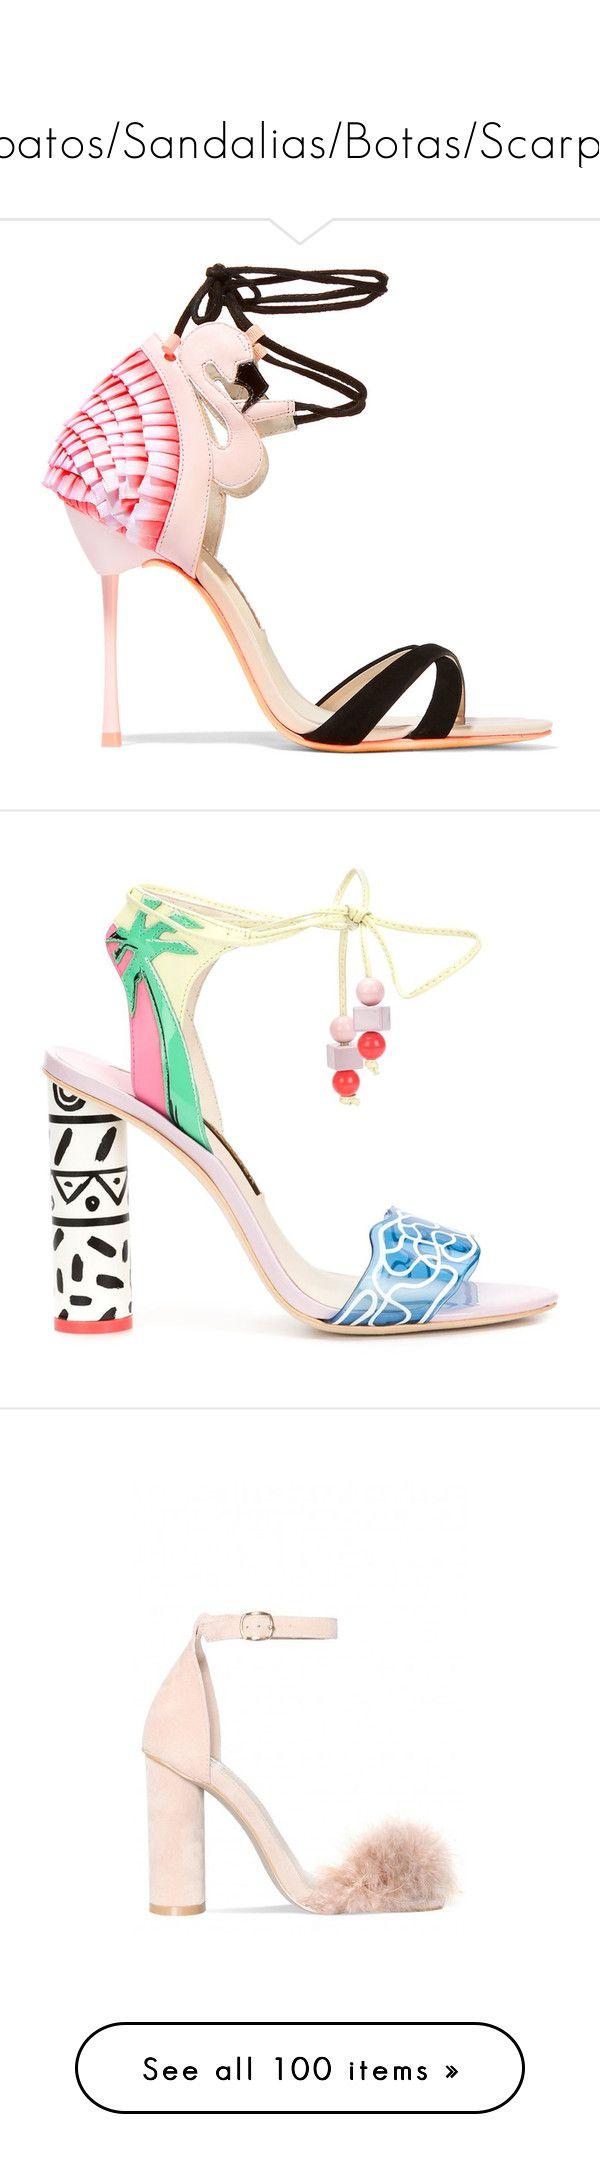 """Sapatos/Sandalias/Botas/Scarpin"" by gabriel-sampaiooo on Polyvore featuring shoes, sandals, heels, high heels, sophia webster, pink, heeled sandals, pink sandals, ankle strap high heel sandals e ankle strap sandals"